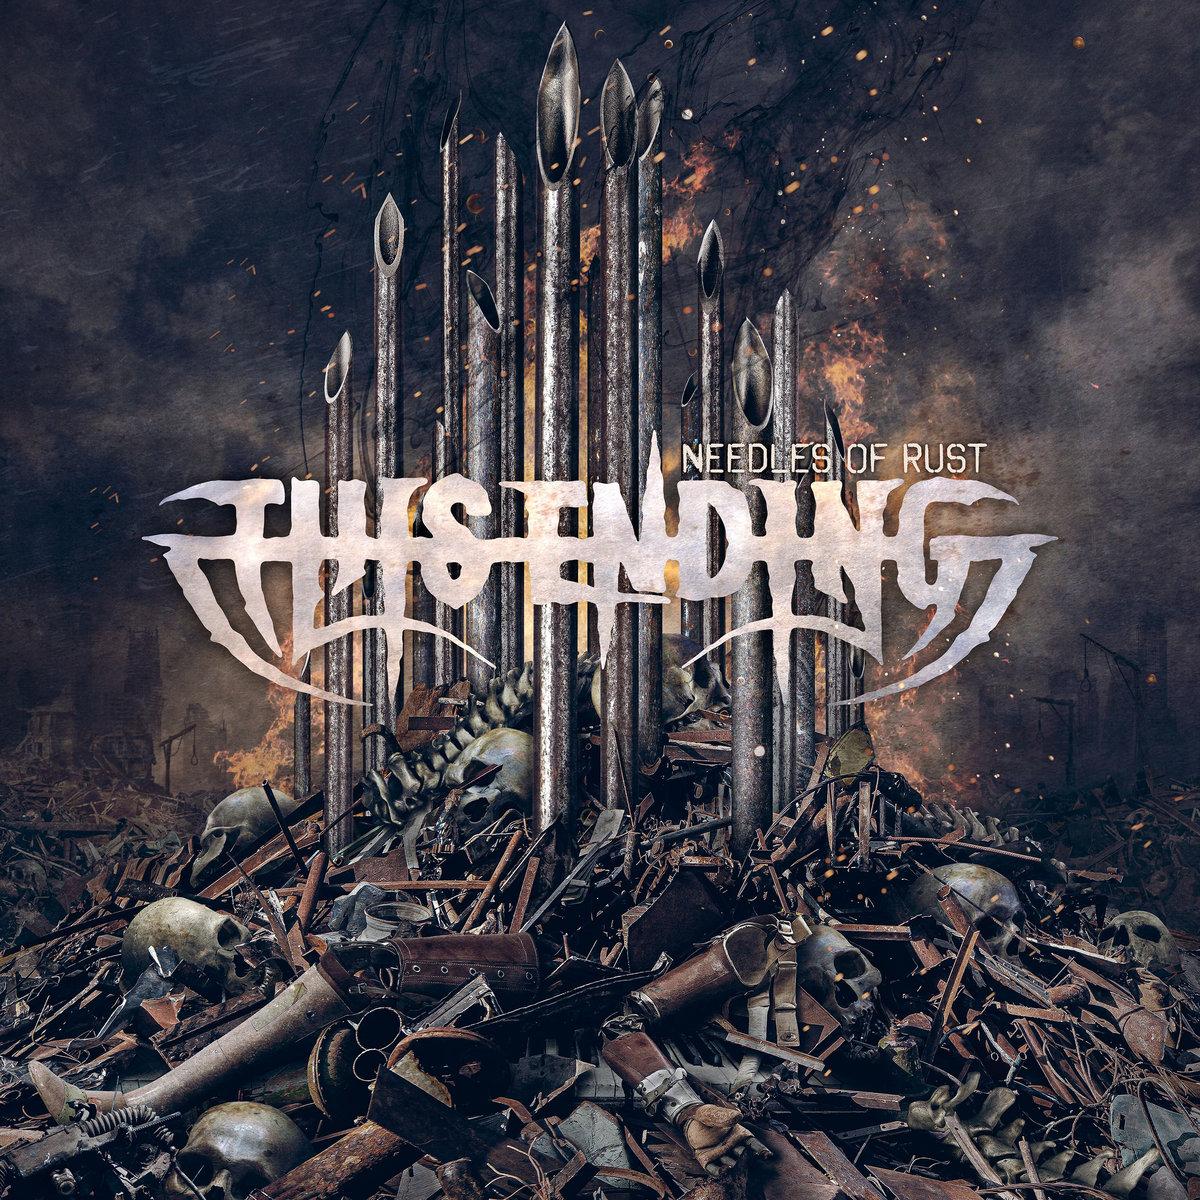 Needles Of Rust This Ending Album Cover Artwork